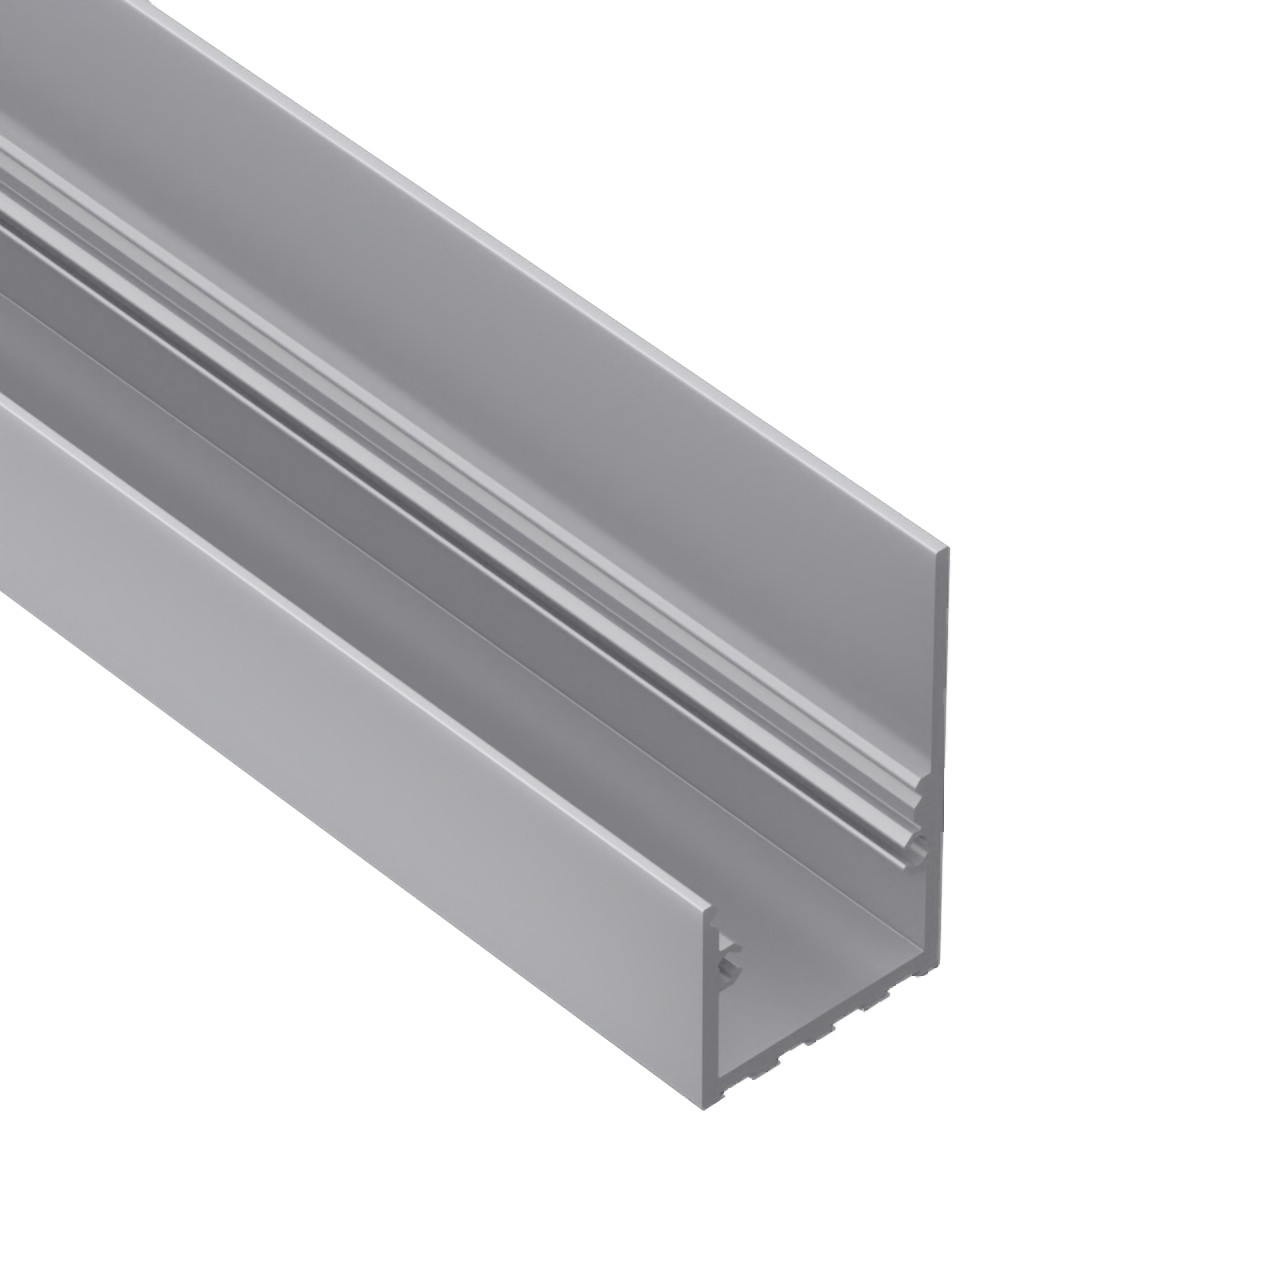 AT14 Surface Mount Led Aluminum Profile